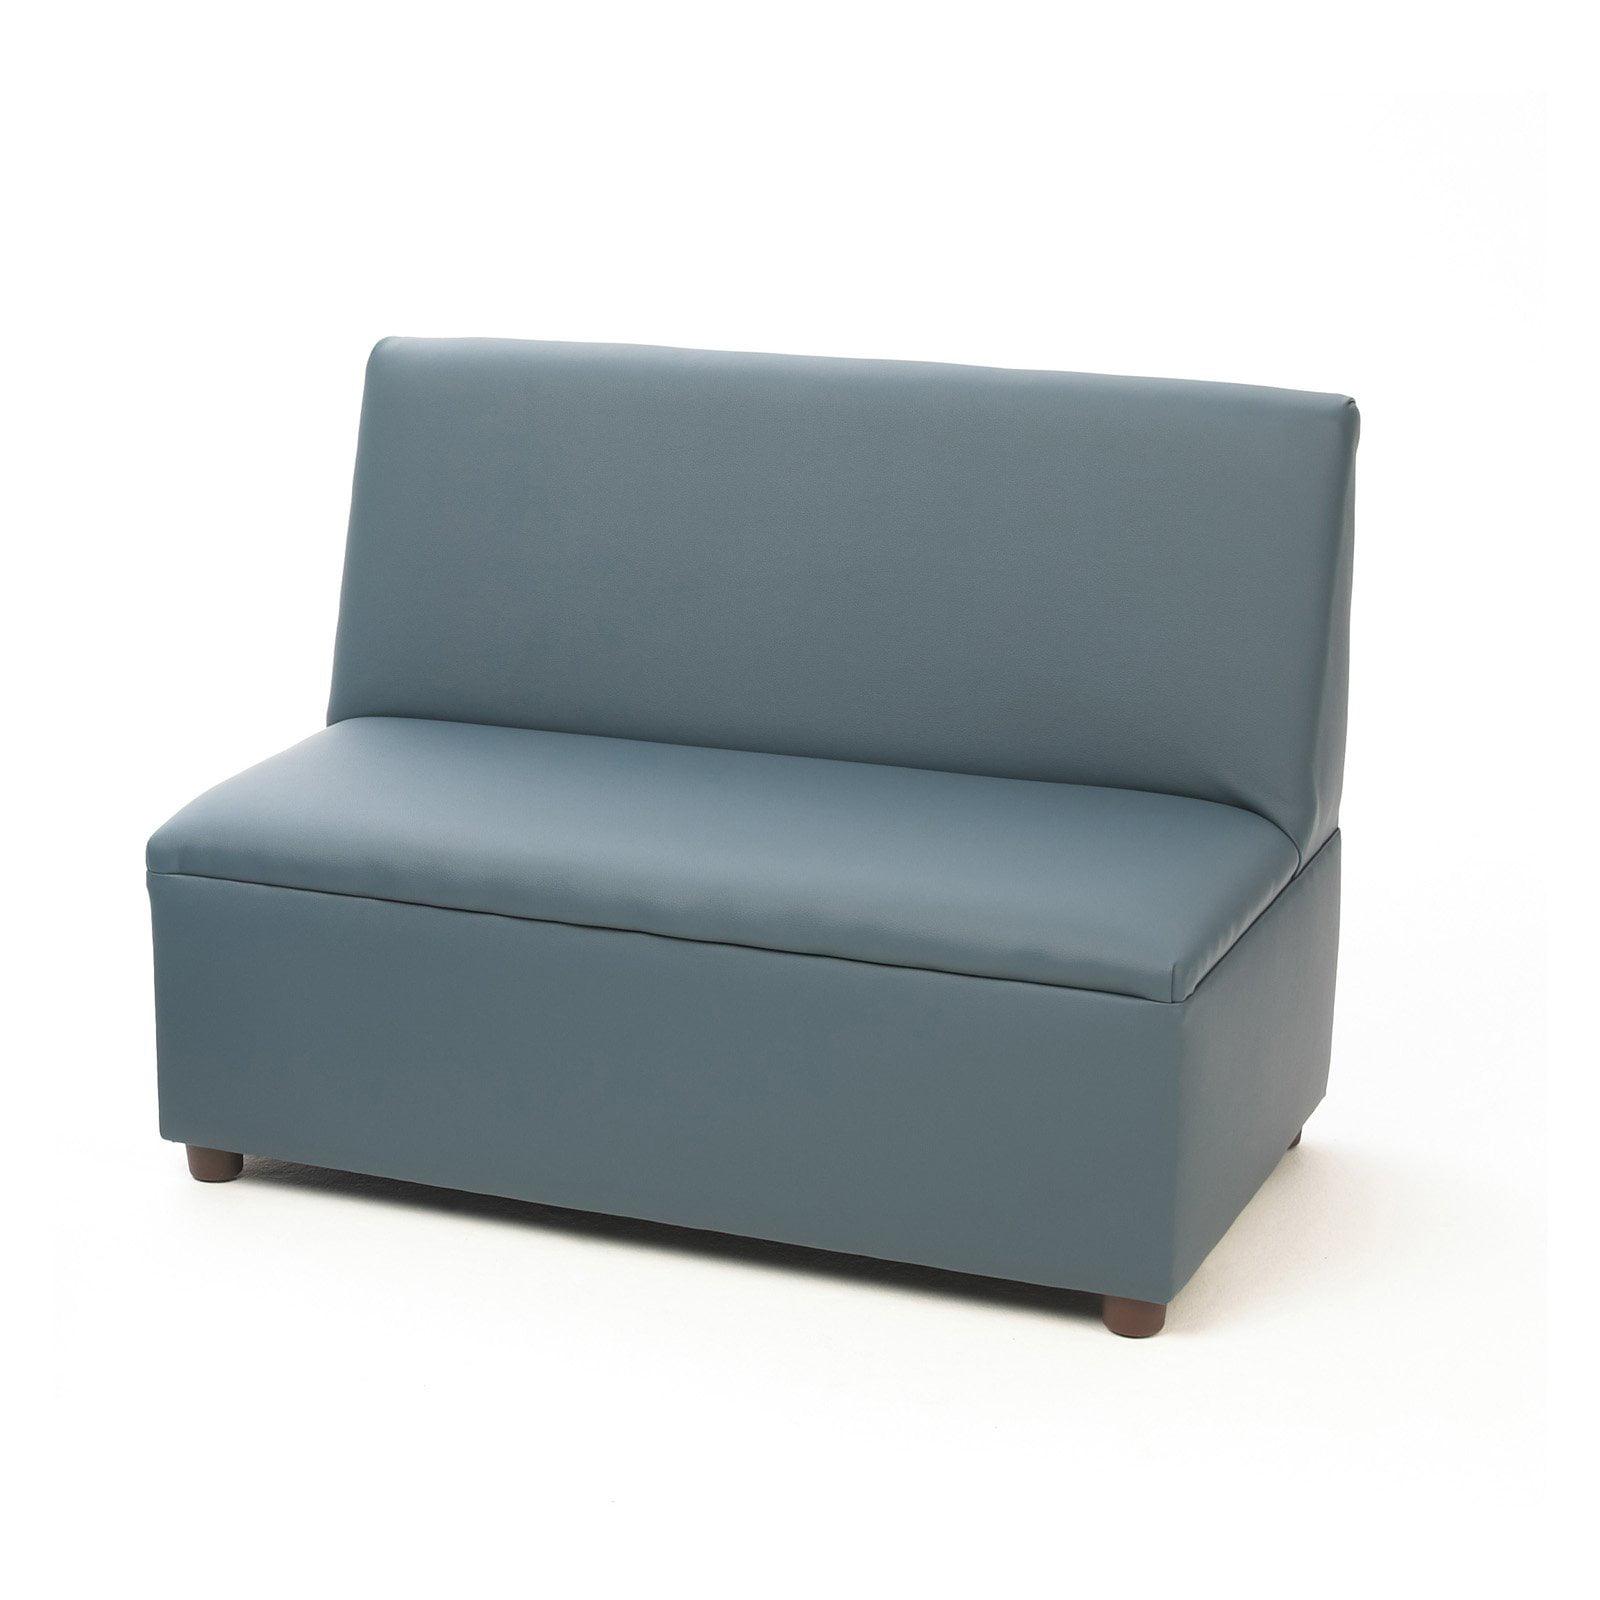 Brand New World Modern Casual Enviro-Child Upholstered Sofa by Brand New World